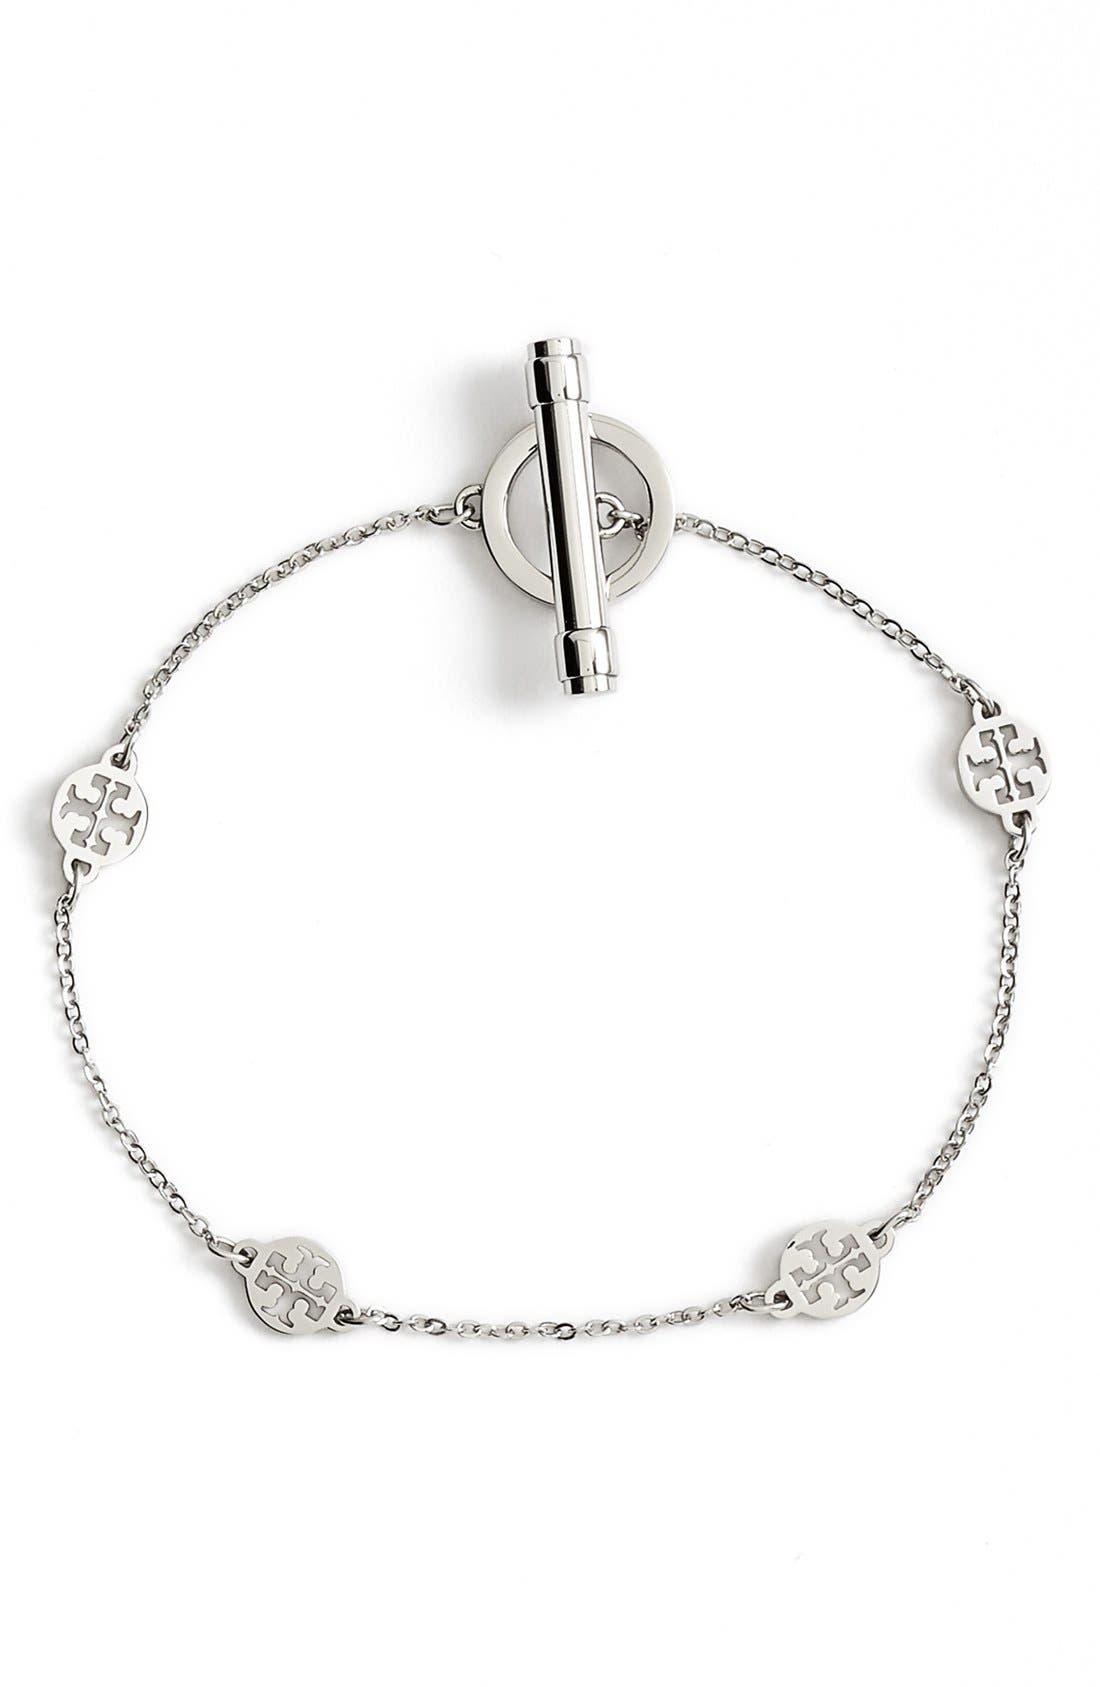 Main Image - Tory Burch Logo Station Toggle Bracelet